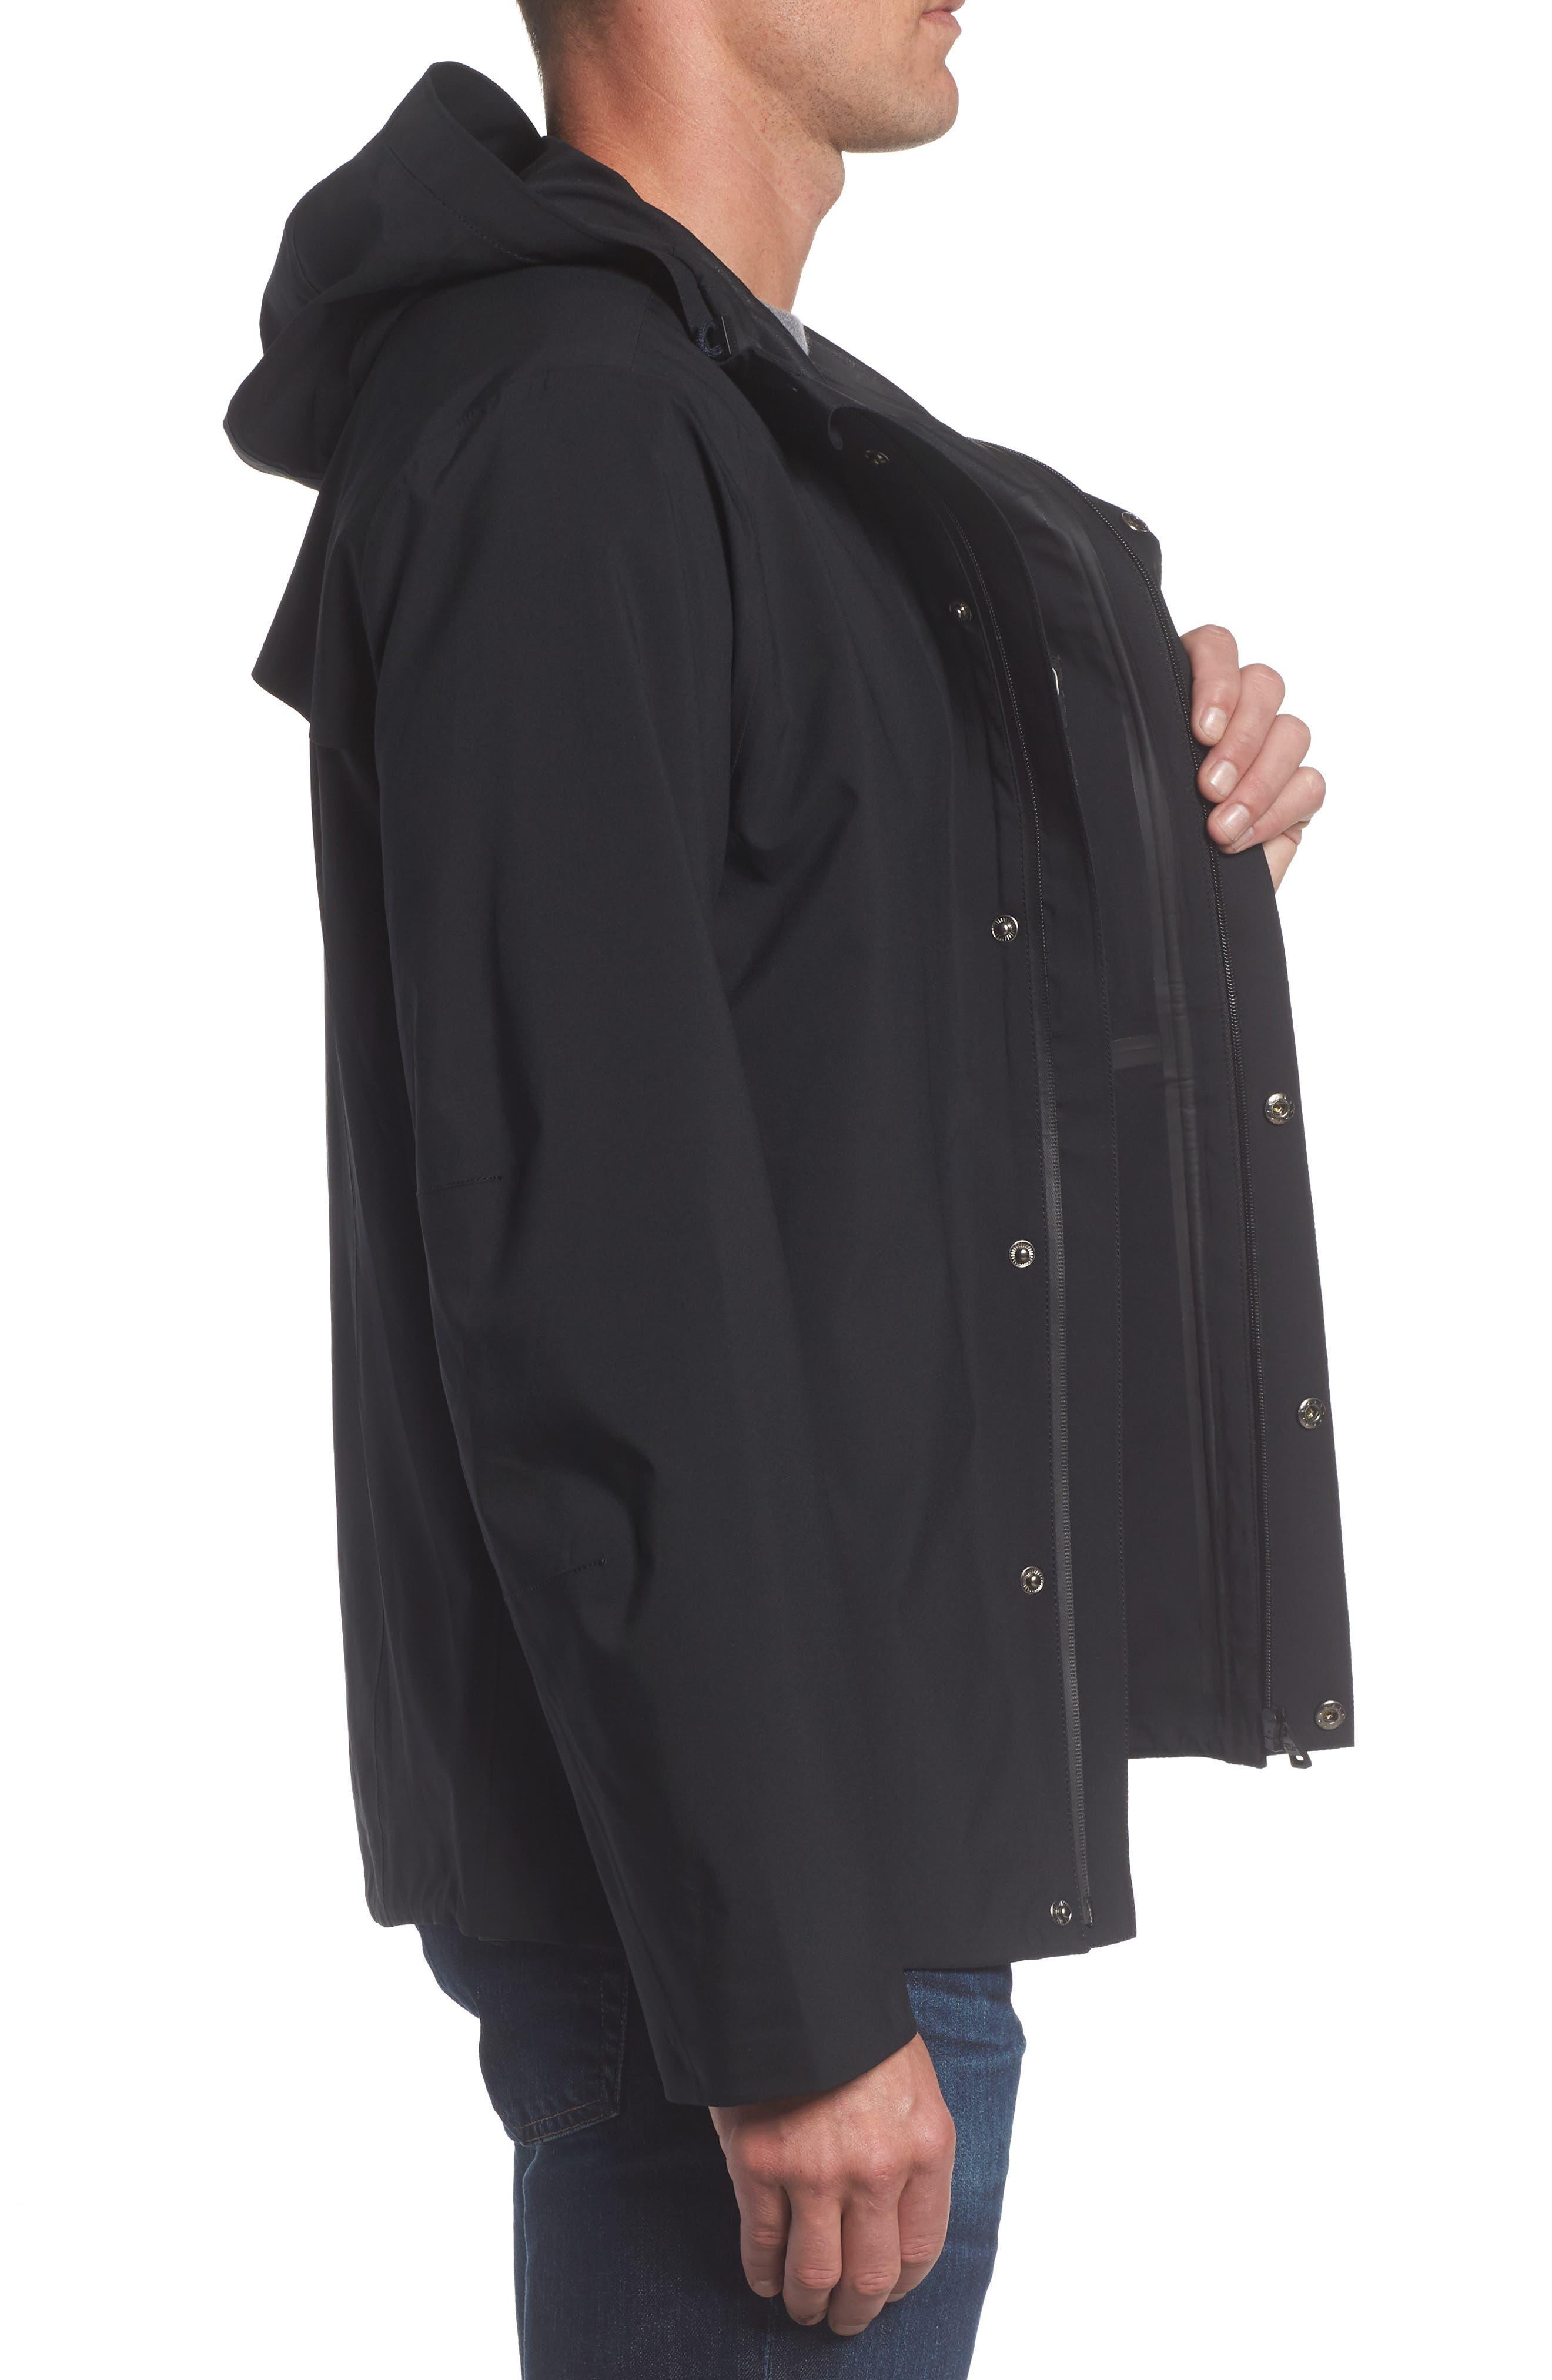 Marc New York Stratus Waterproof Hooded Rain Jacket,                             Alternate thumbnail 3, color,                             001